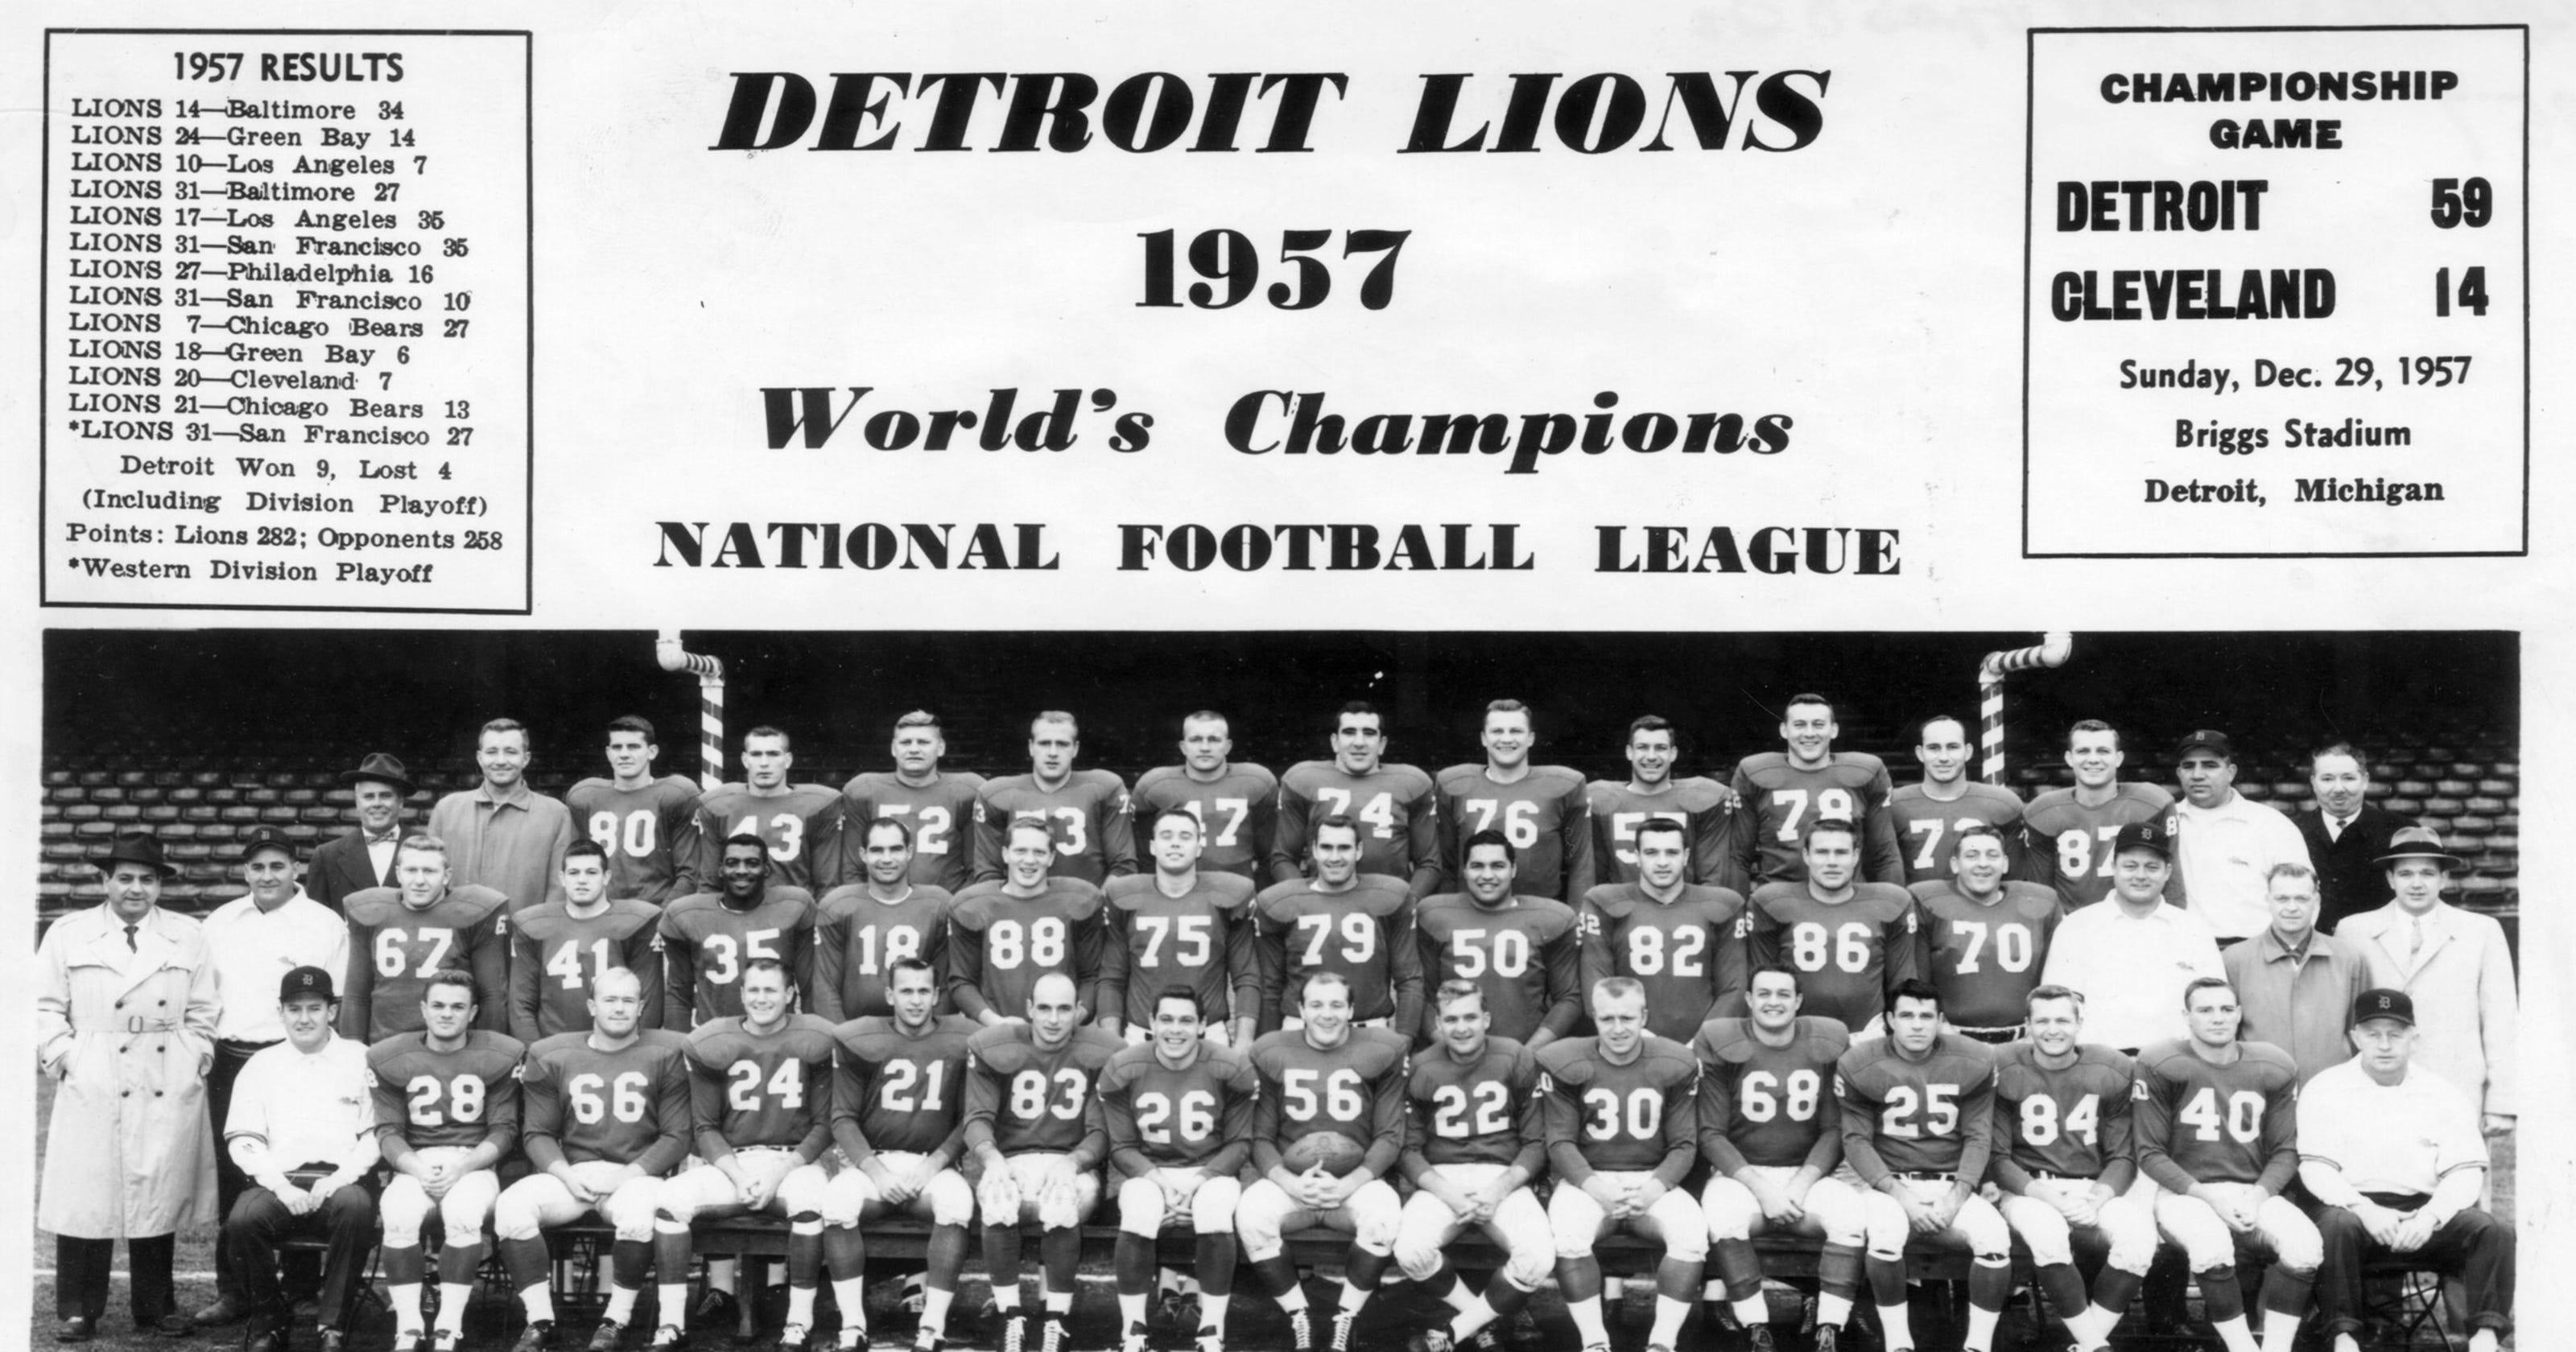 1957 Detroit Lions: Meet the championship roster